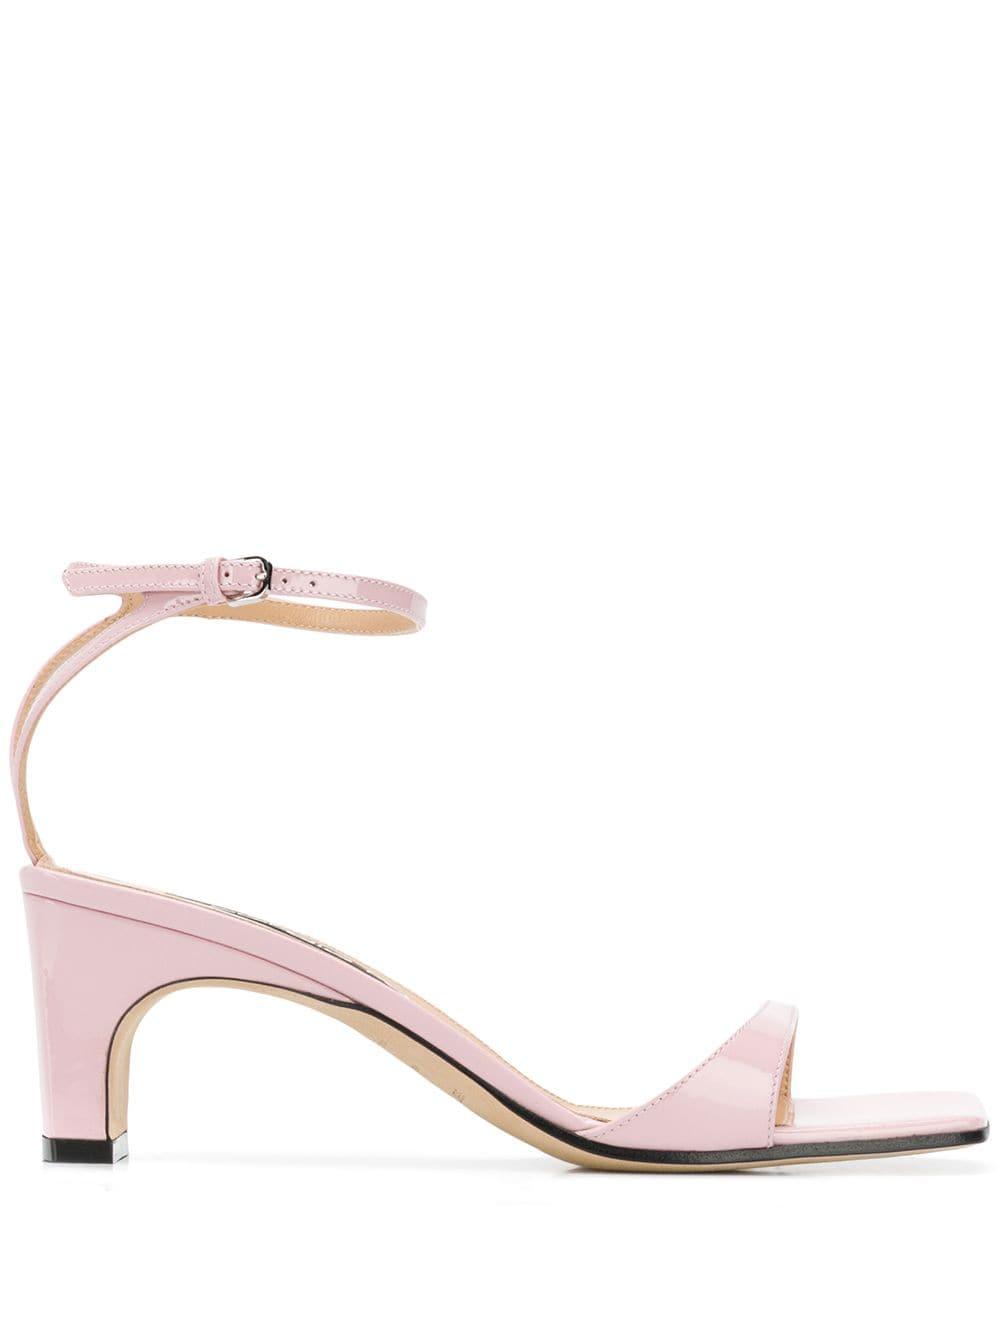 Sergio Rossi open toe sandals - Pink